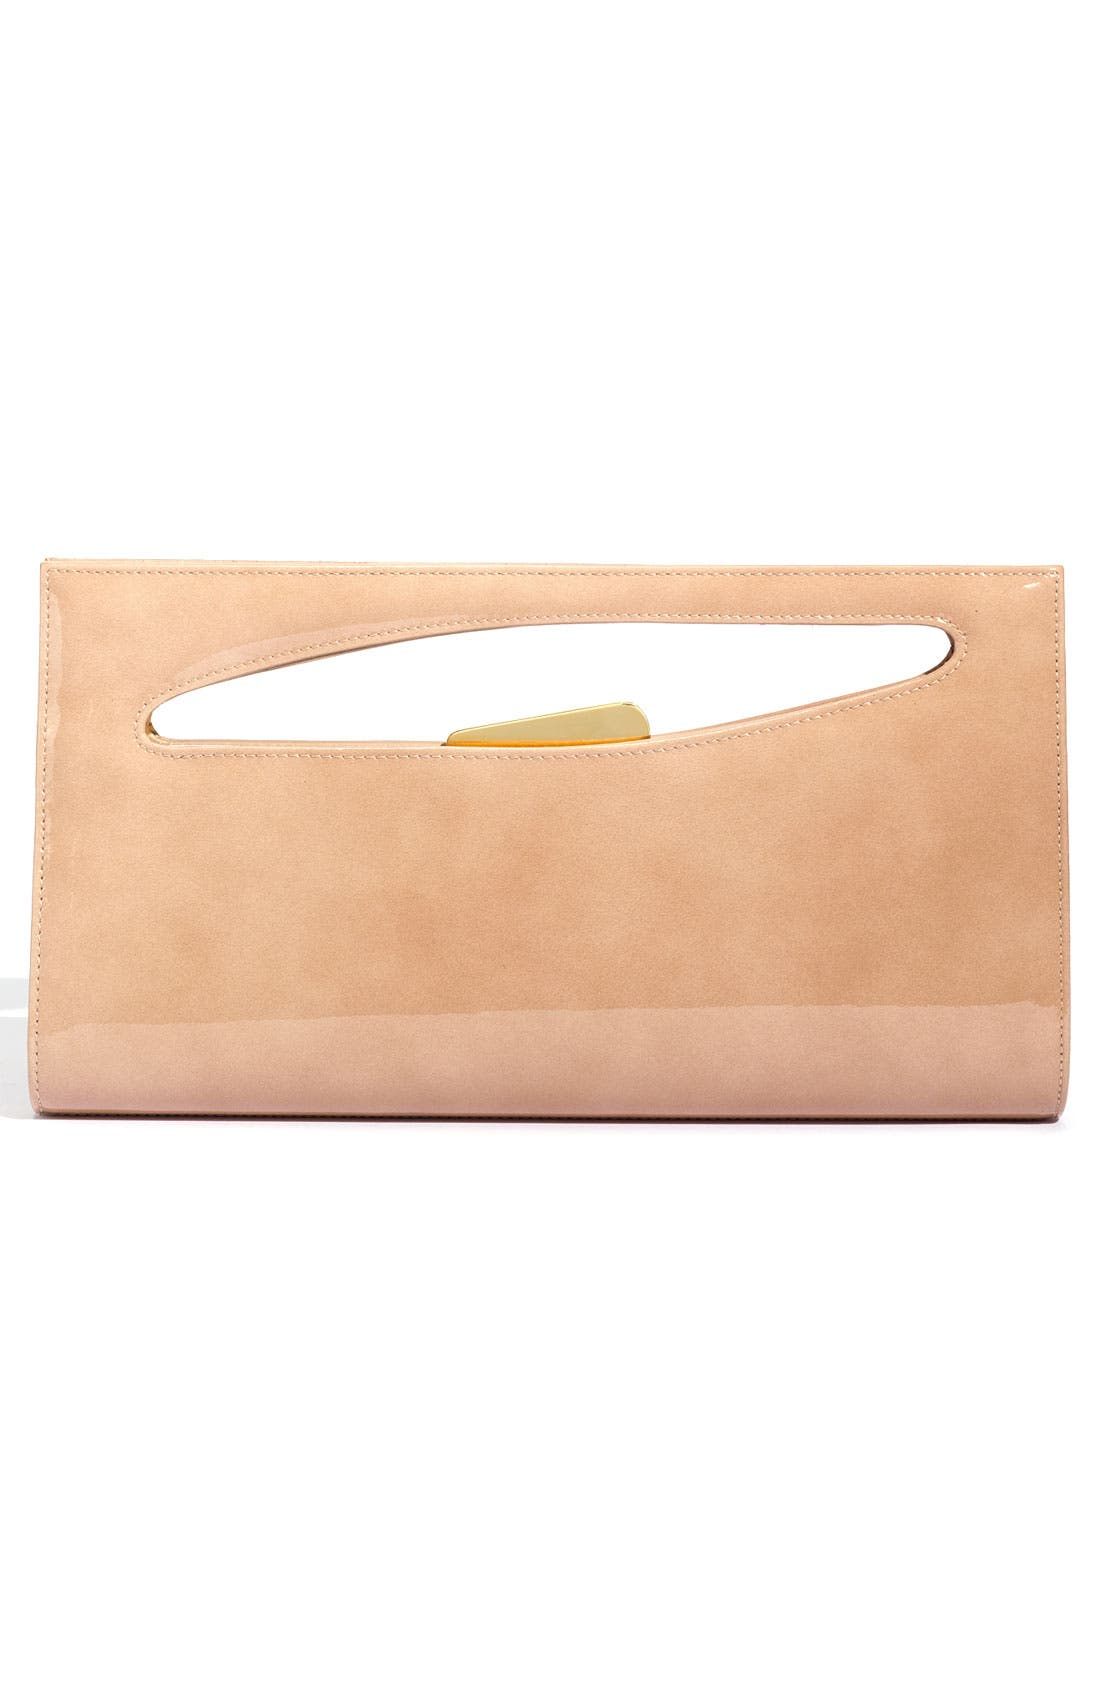 STUART WEITZMAN,                             'Grip' Handbag,                             Alternate thumbnail 4, color,                             002